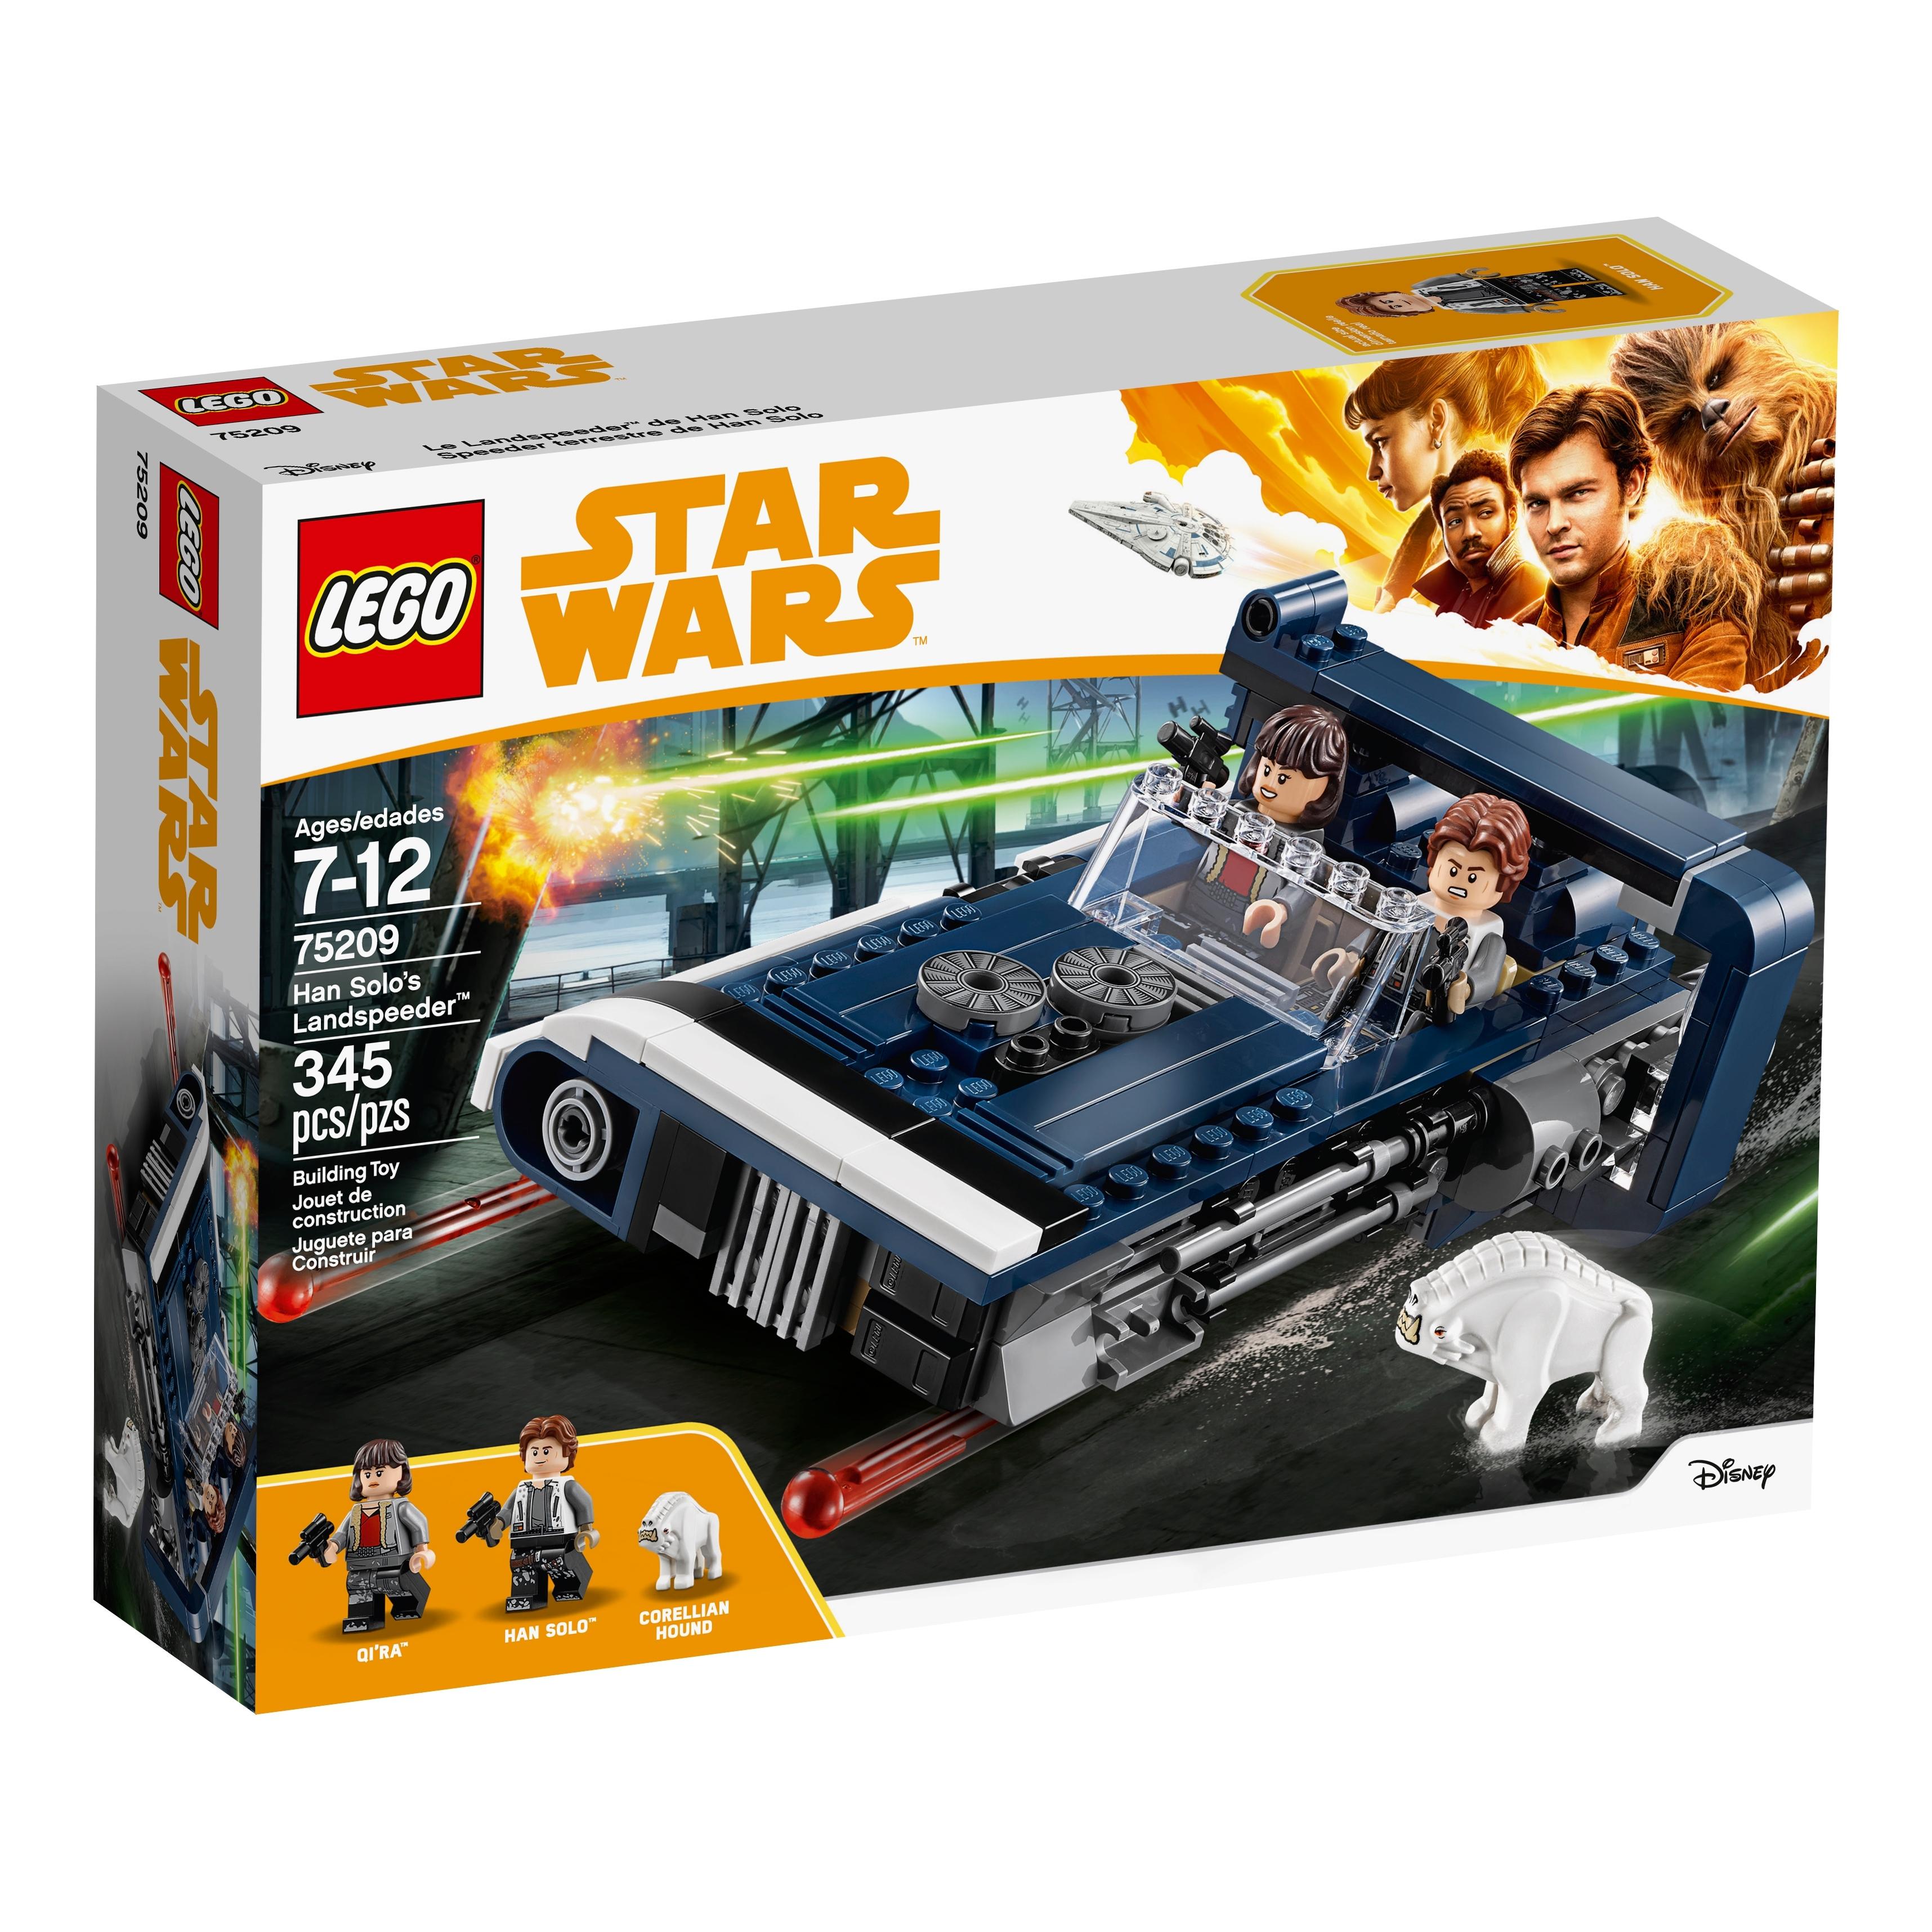 Lego Star Wars Corellian Hound Dog Minifigures  75209 75210 Solo